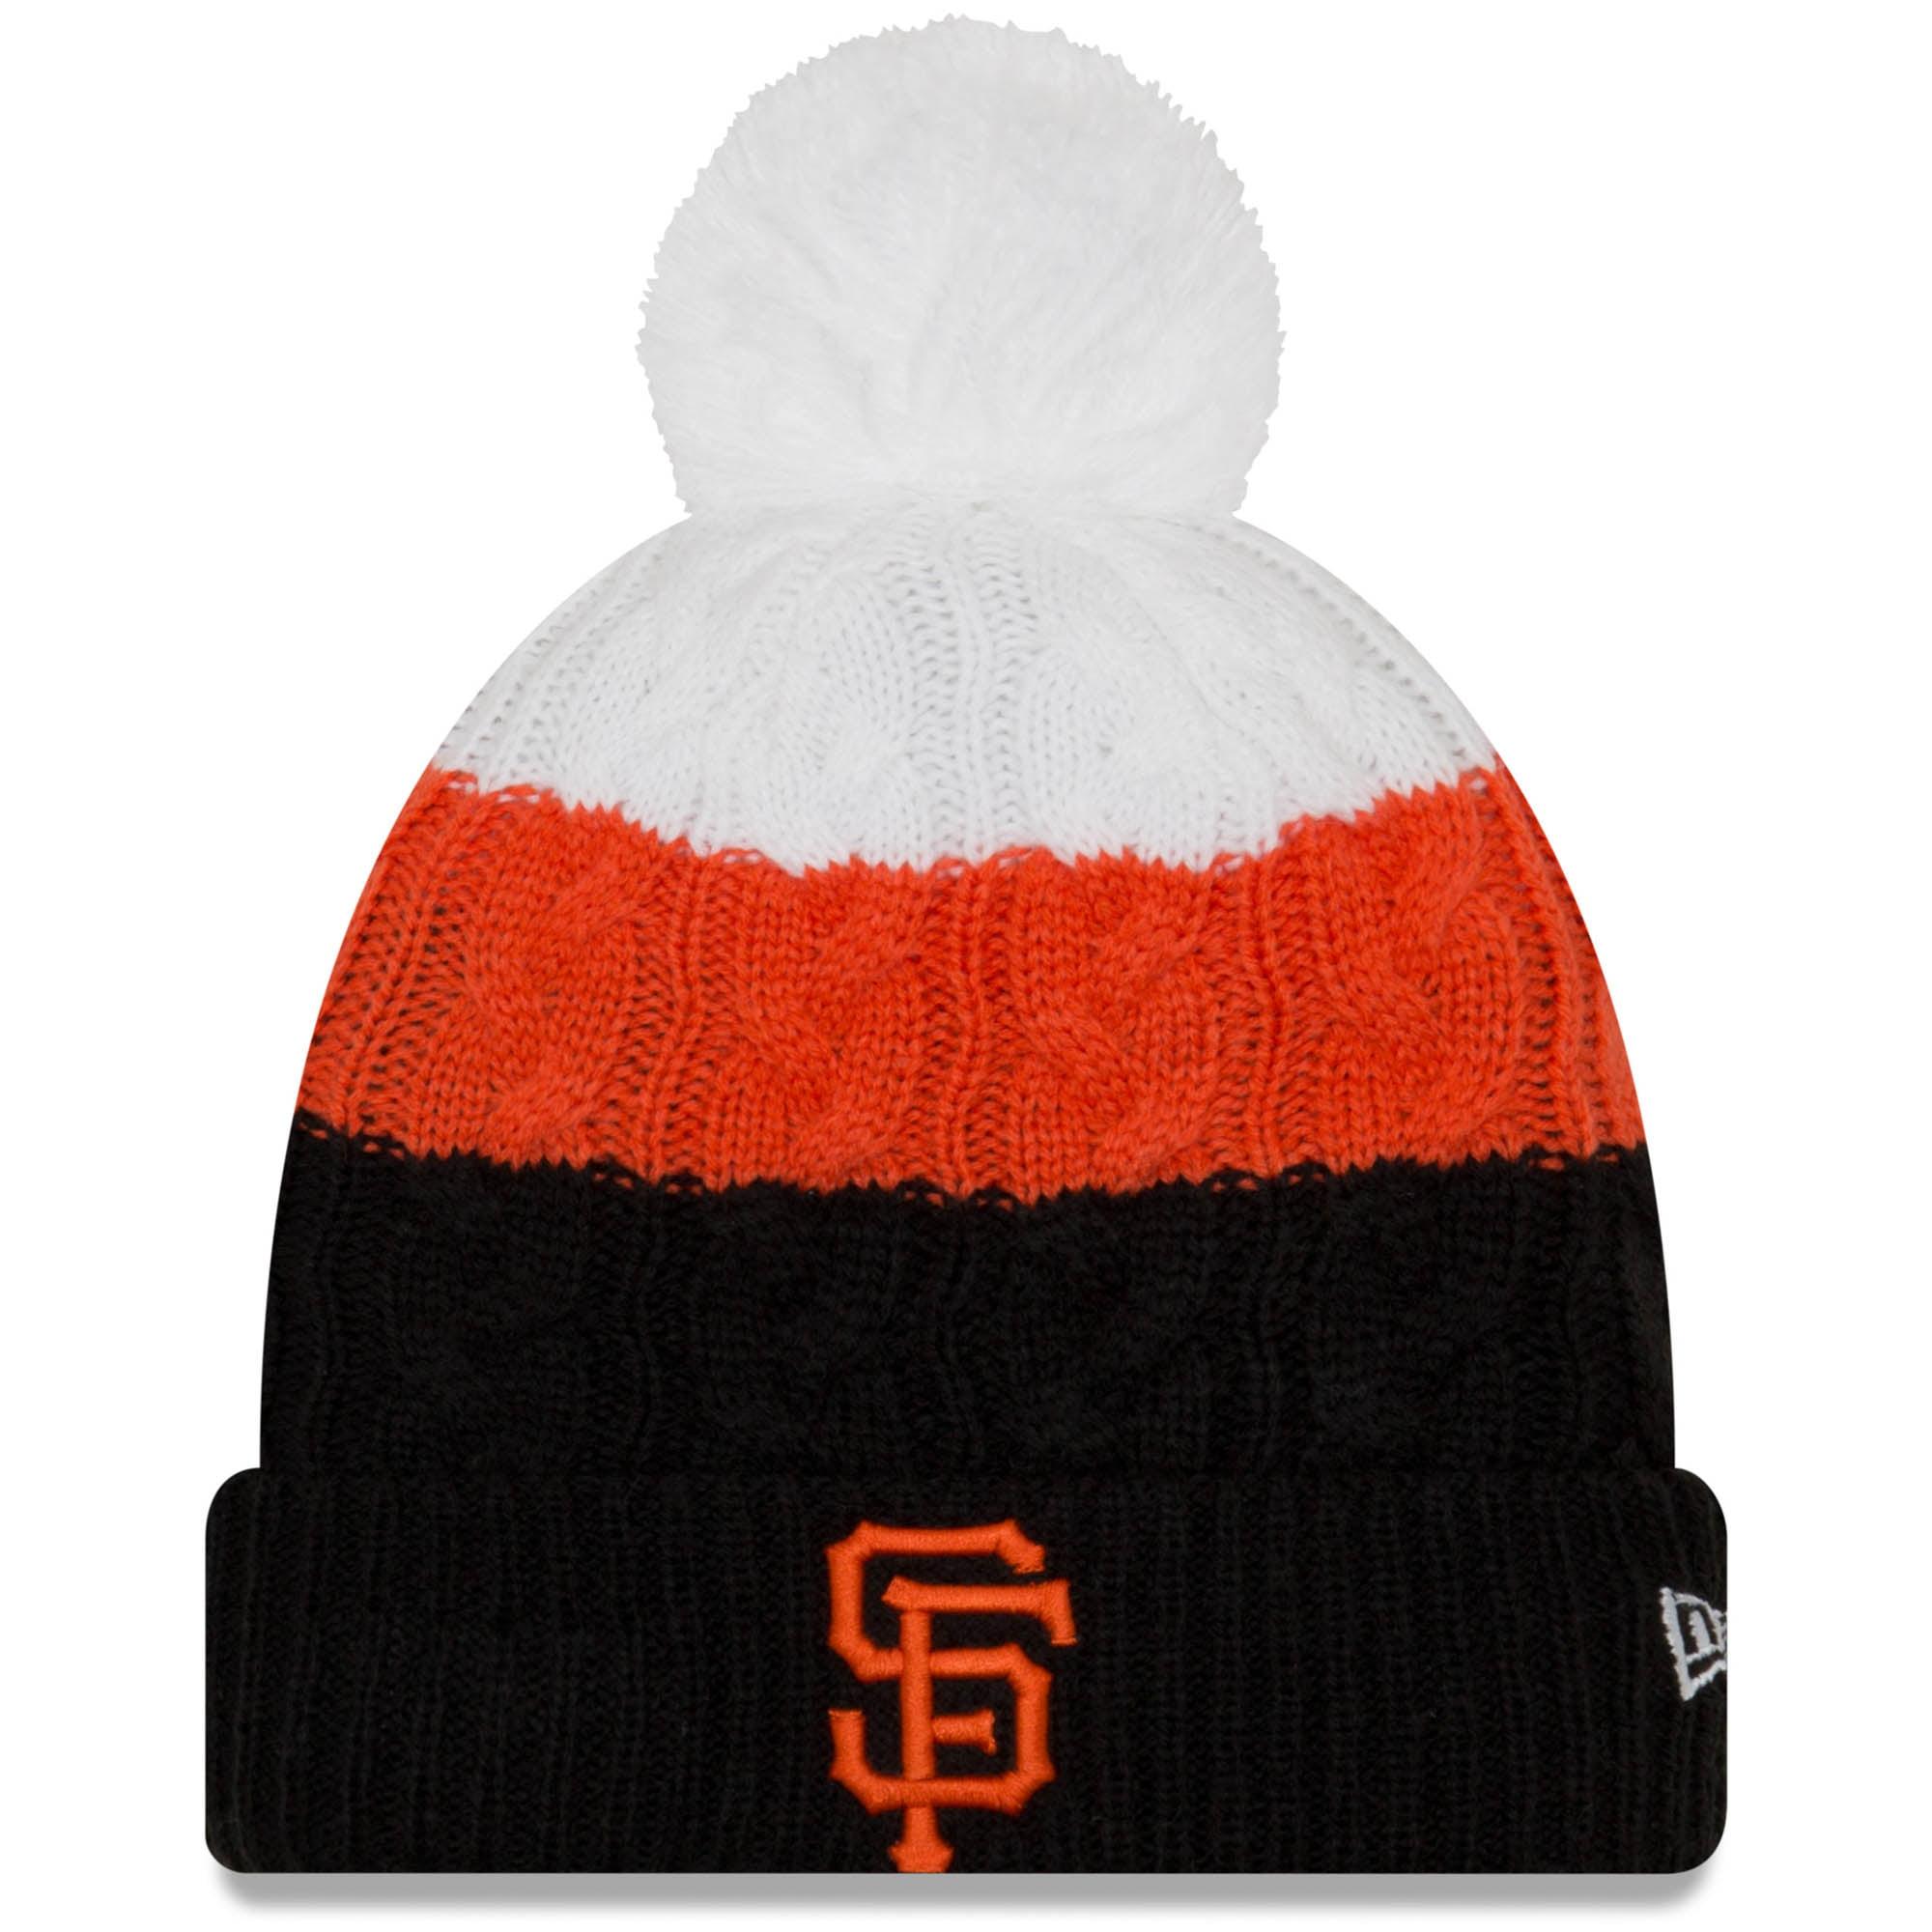 San Francisco Giants New Era Women's Layered Up 2 Cuffed Knit Hat with Pom Black OSFA by NEW ERA CAP COMPANY